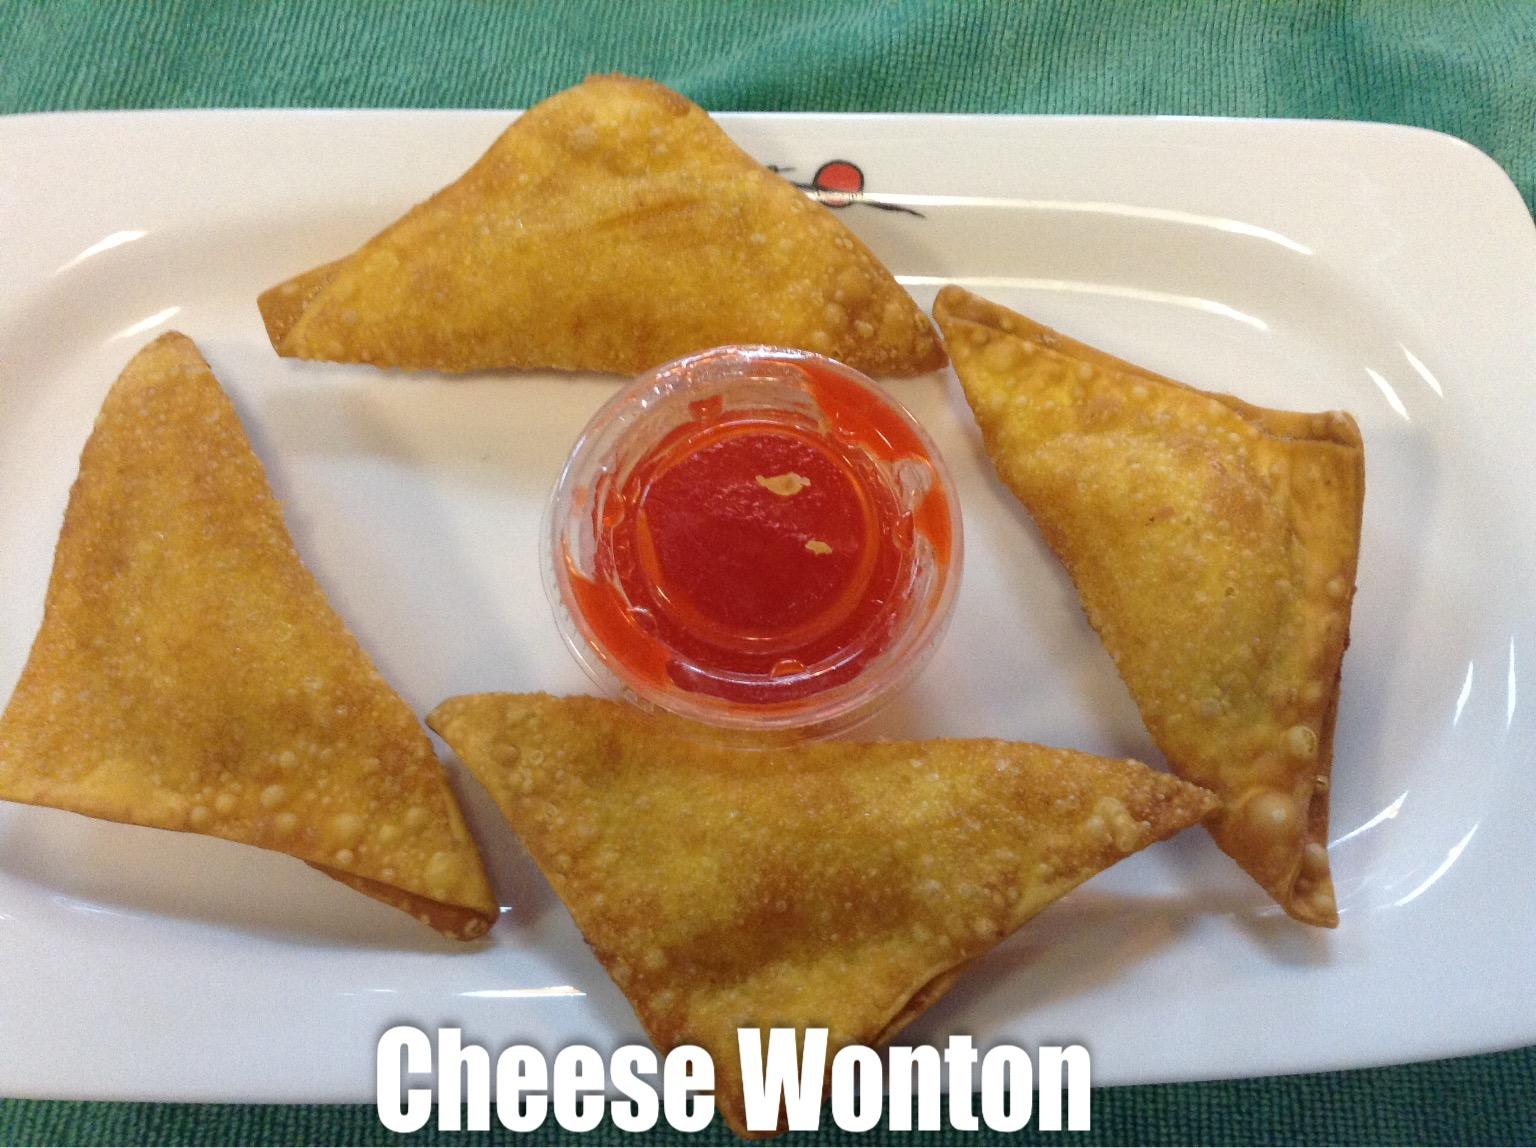 Cheese Wonton (4) Image